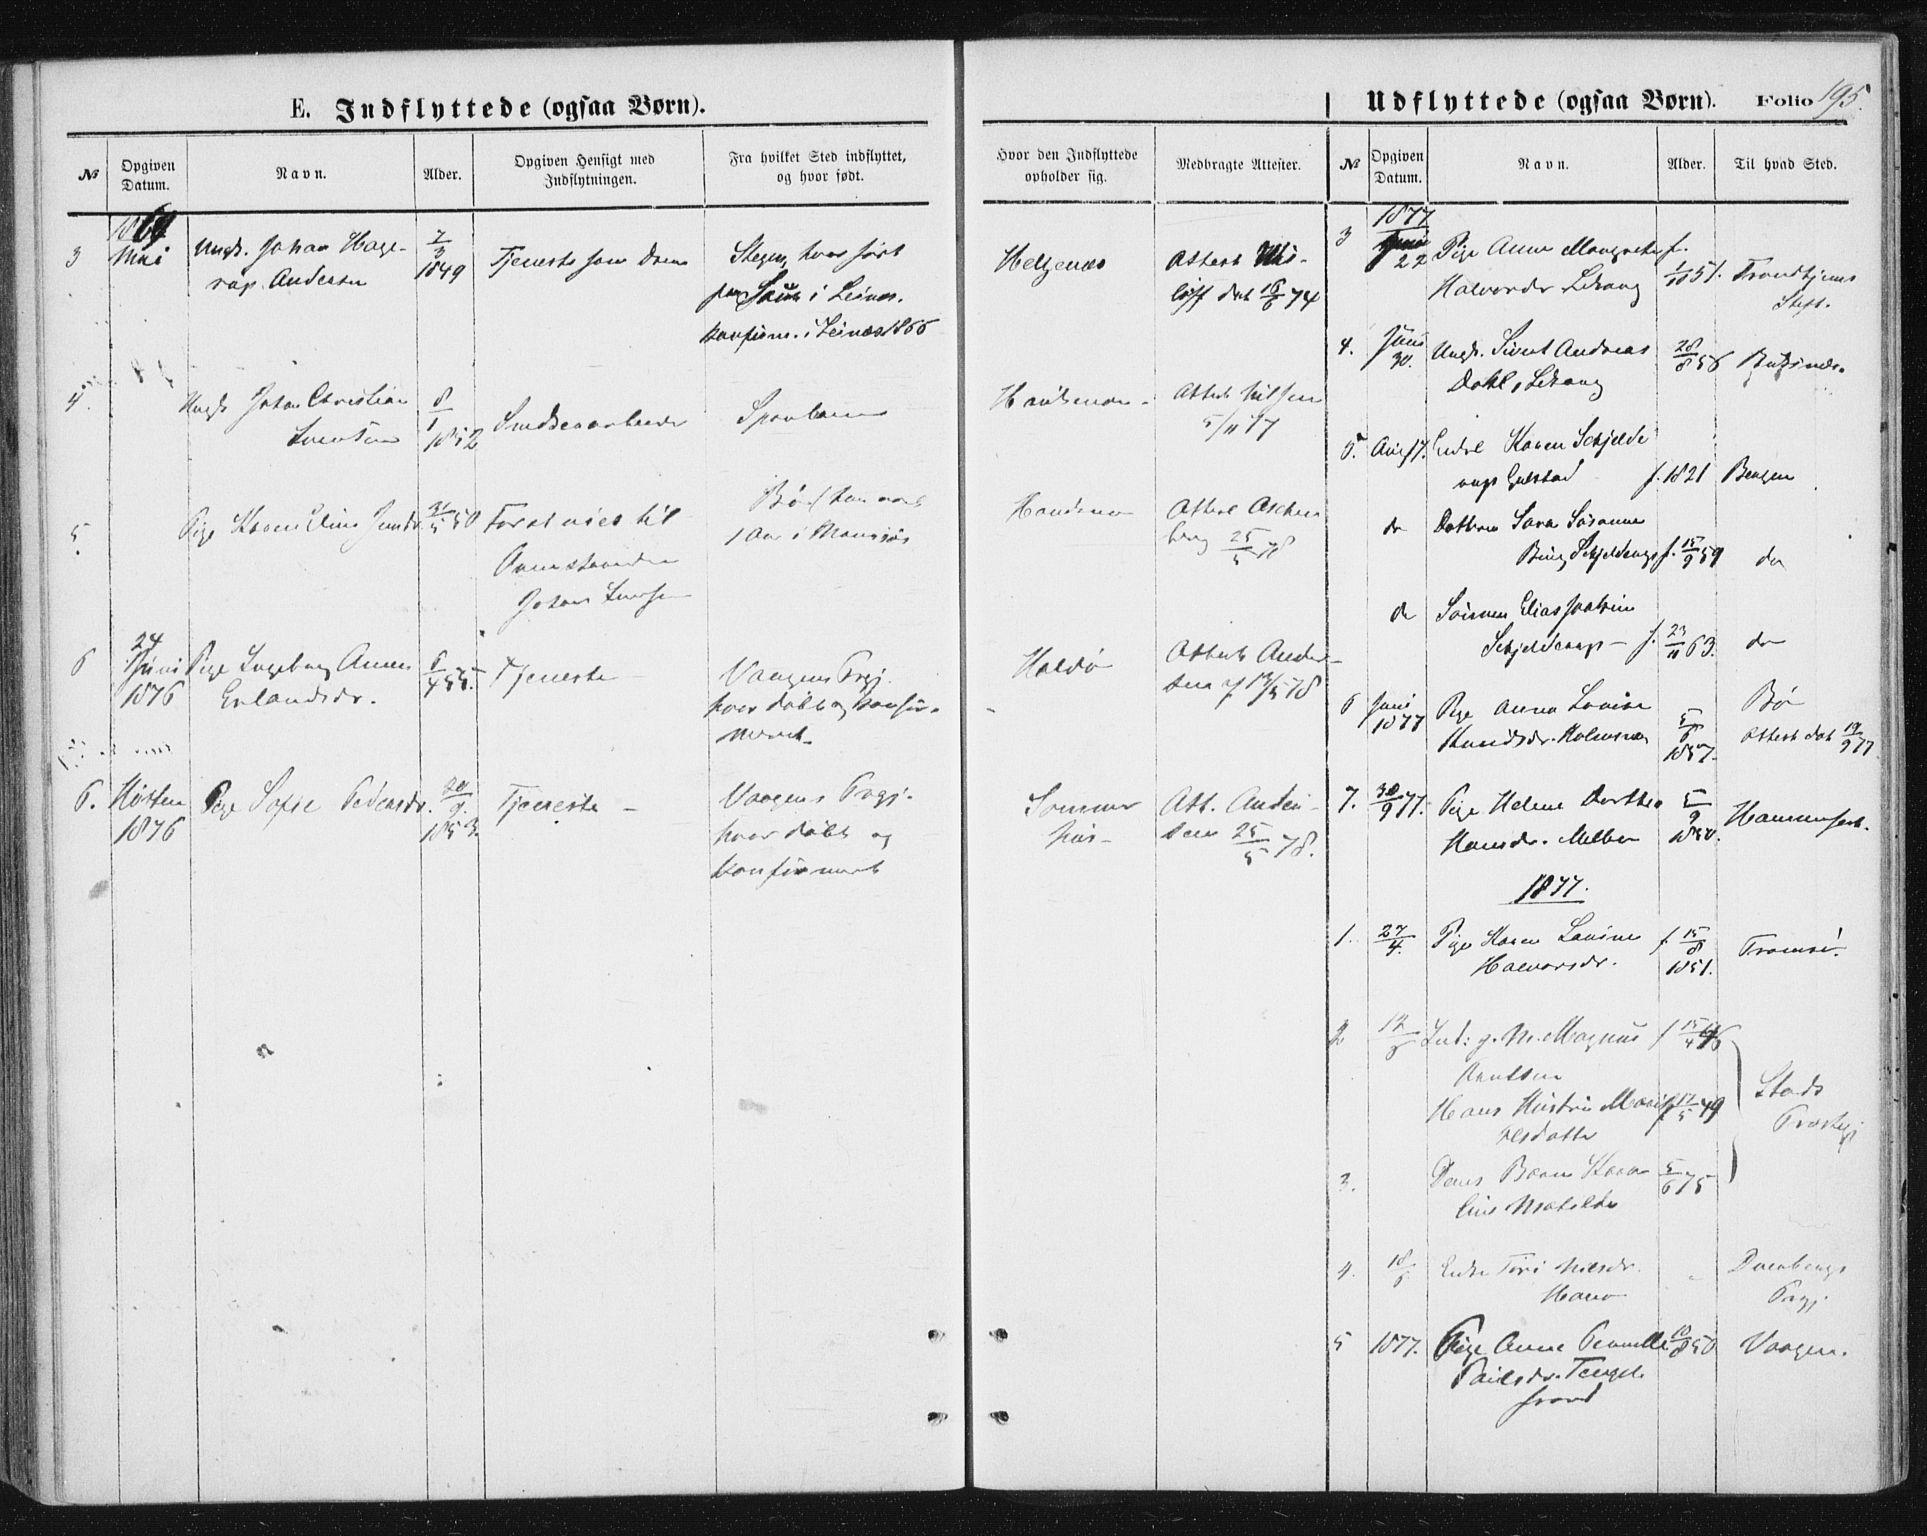 SAT, Ministerialprotokoller, klokkerbøker og fødselsregistre - Nordland, 888/L1243: Ministerialbok nr. 888A09, 1876-1879, s. 195